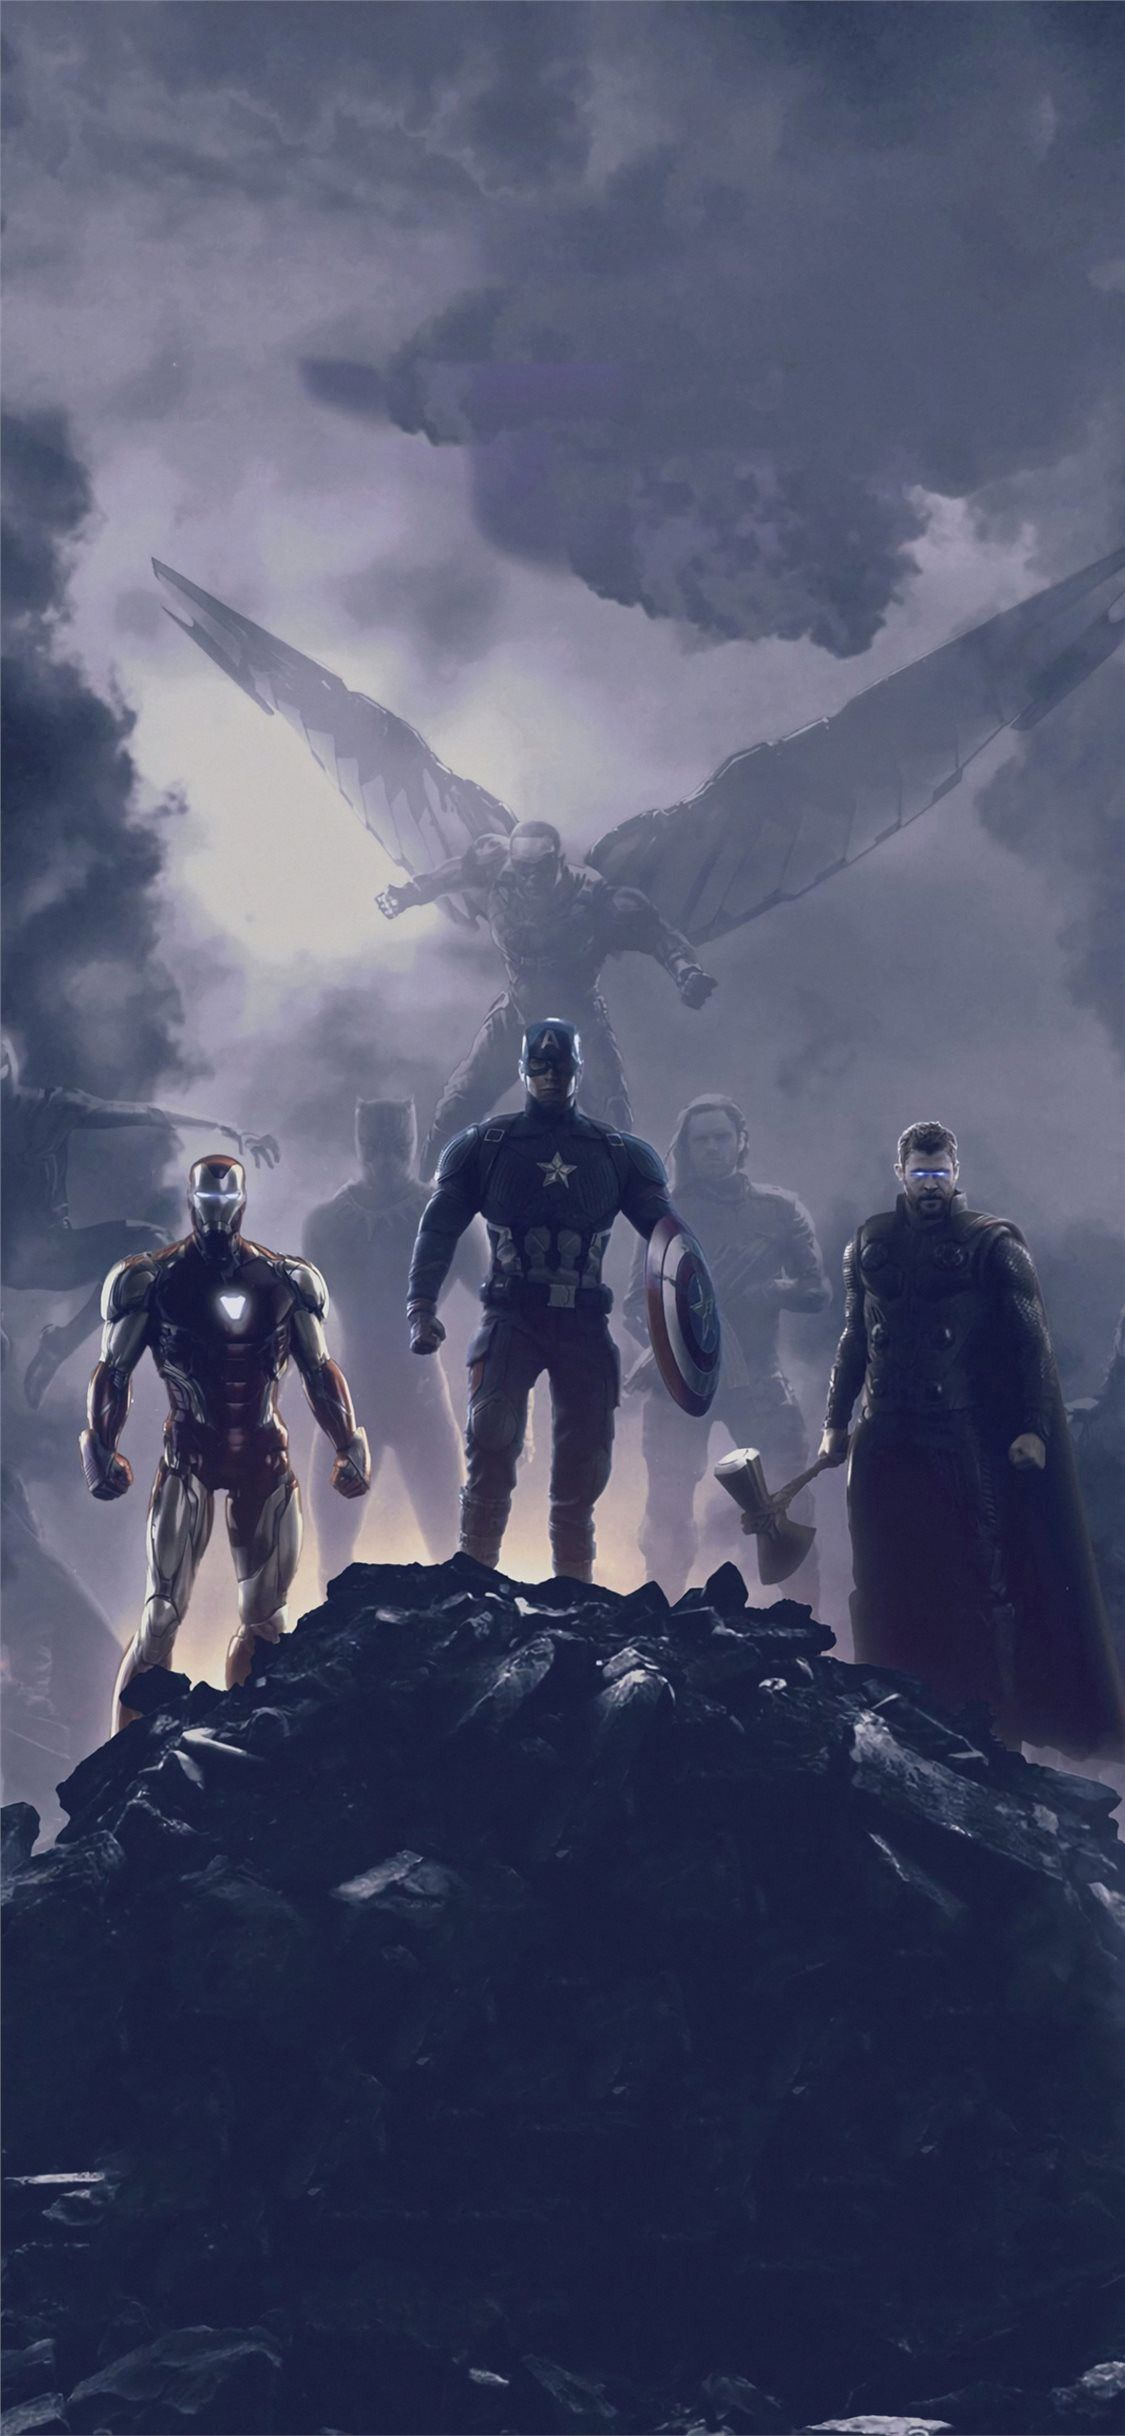 Awesome Avengers Endgame Trinity 2019 Iphone X Wallpapers Free Download Avengers Wallpaper Marvel Superheroes Marvel Artwork